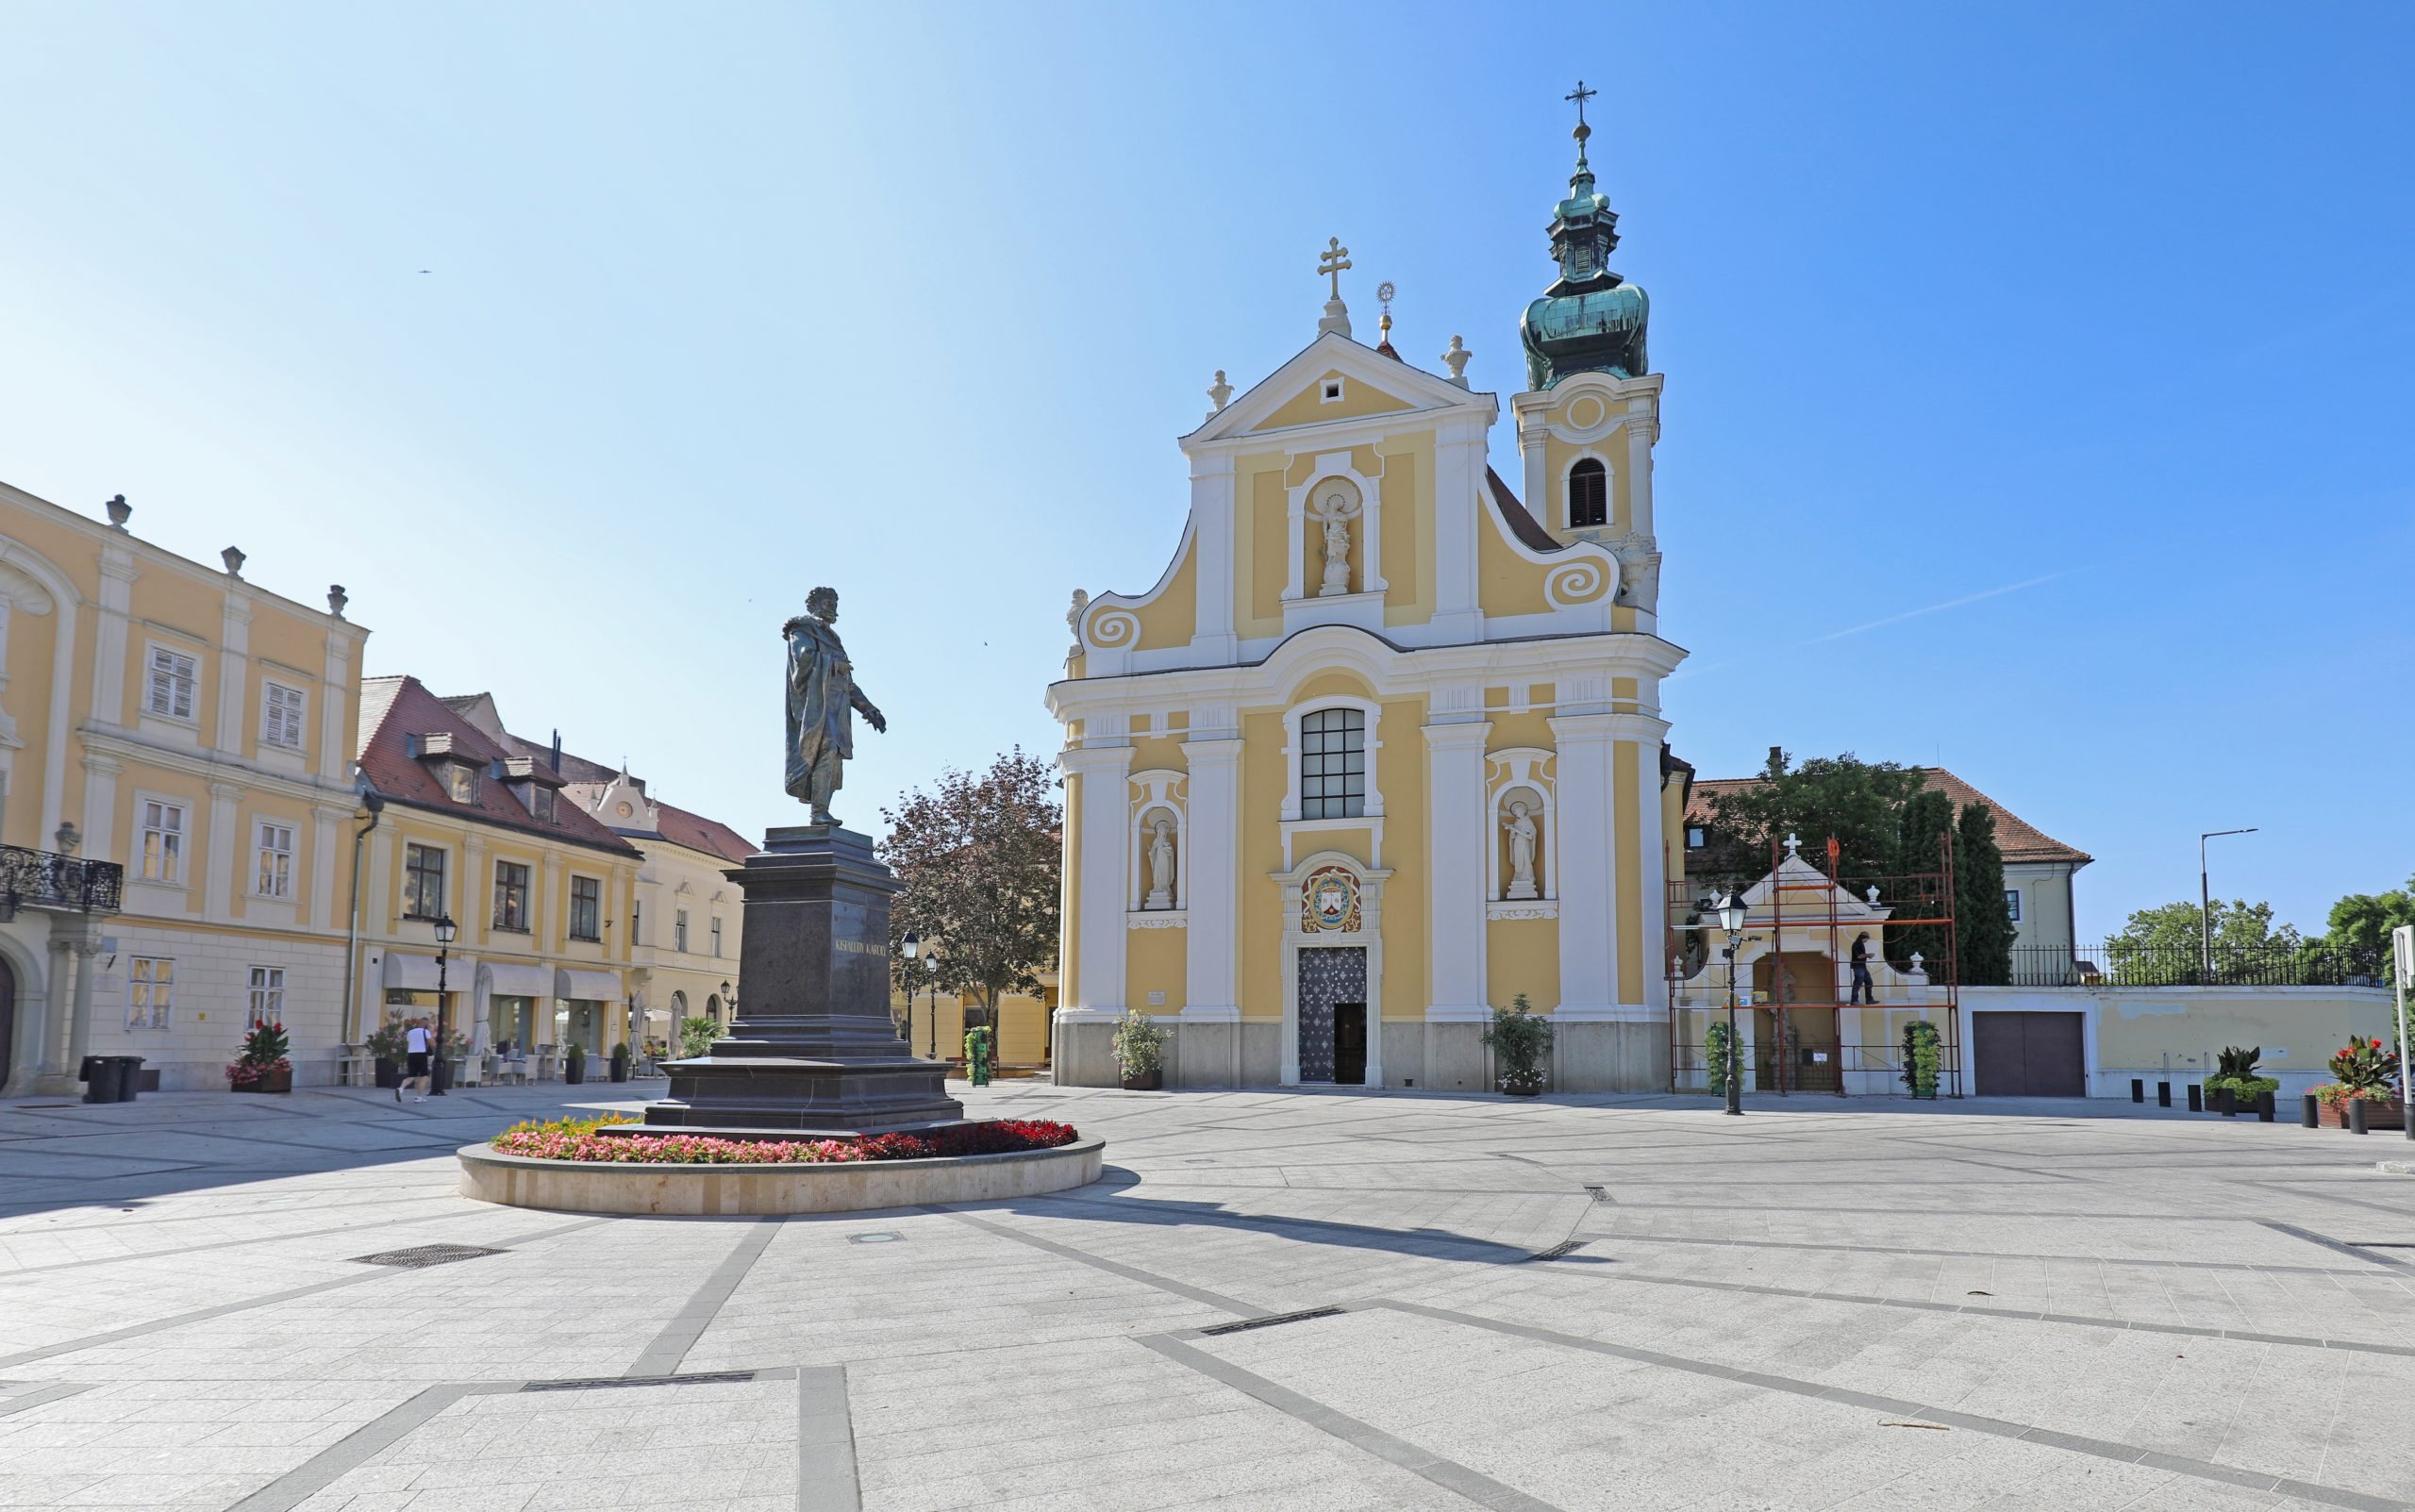 <a href='http://hellogyor.hu/latnivalo/becsi-kapu-ter/'>Bécsi kapu tér</a>